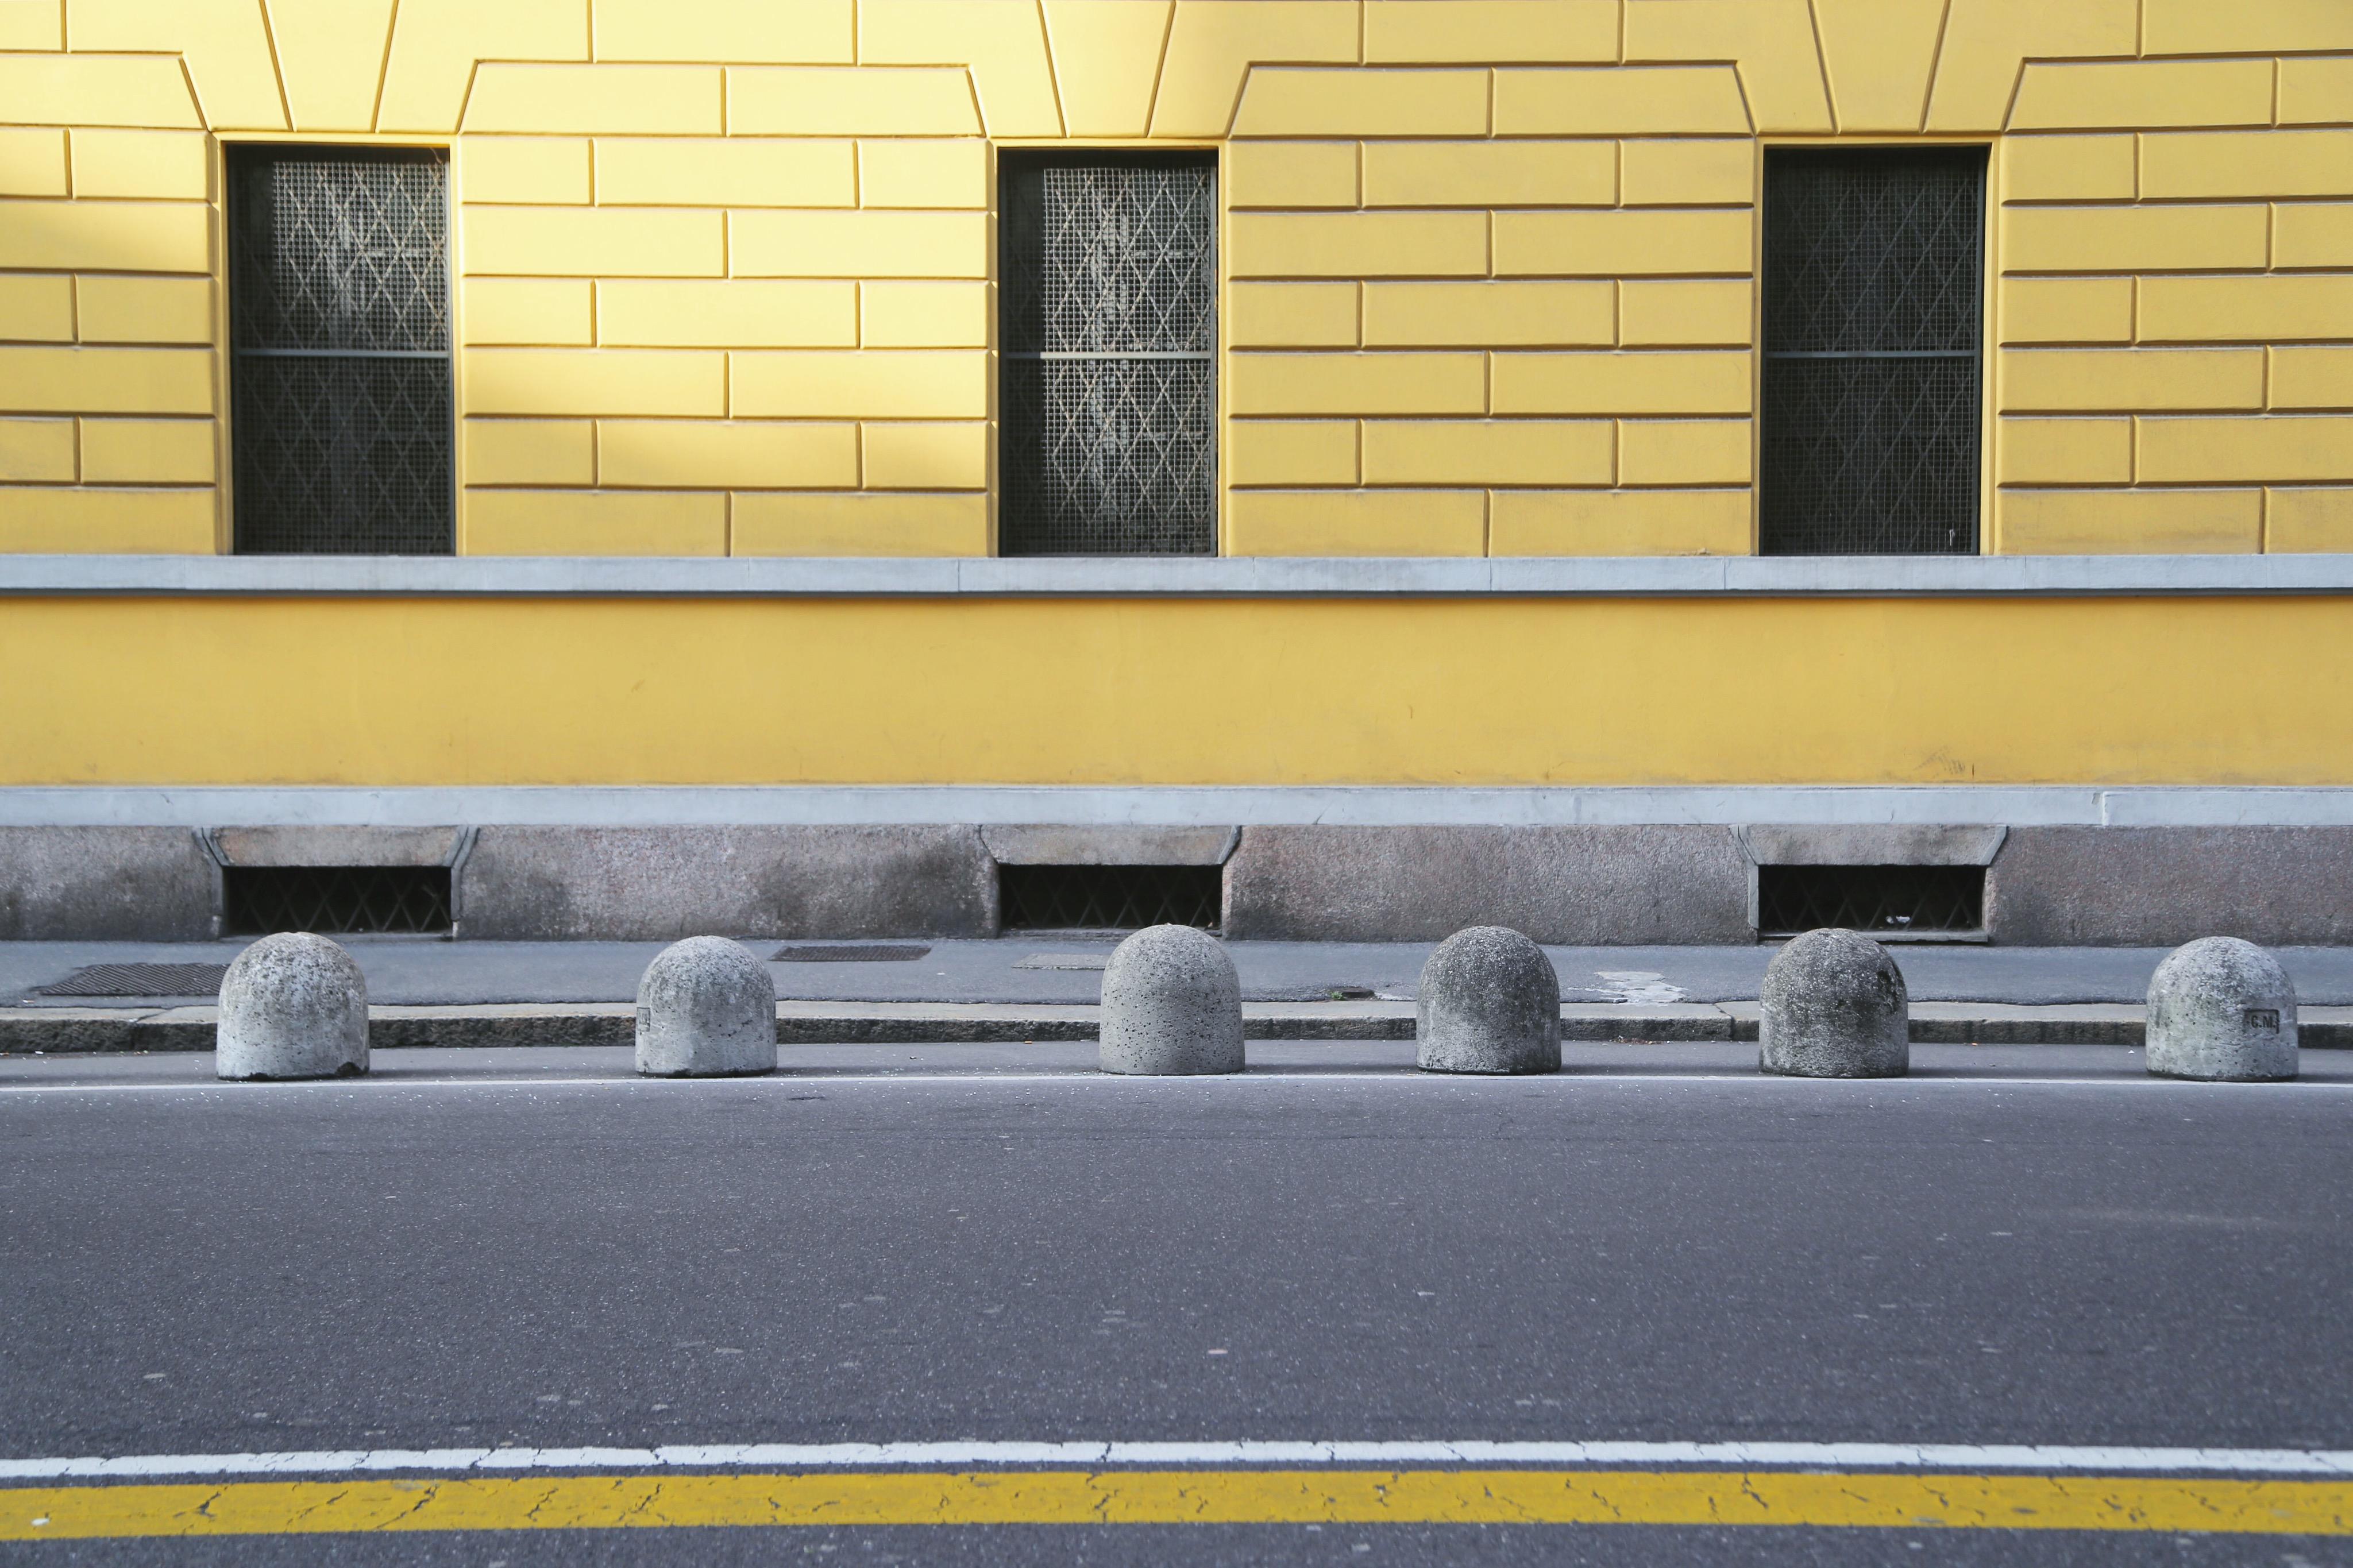 50 yellows of grey